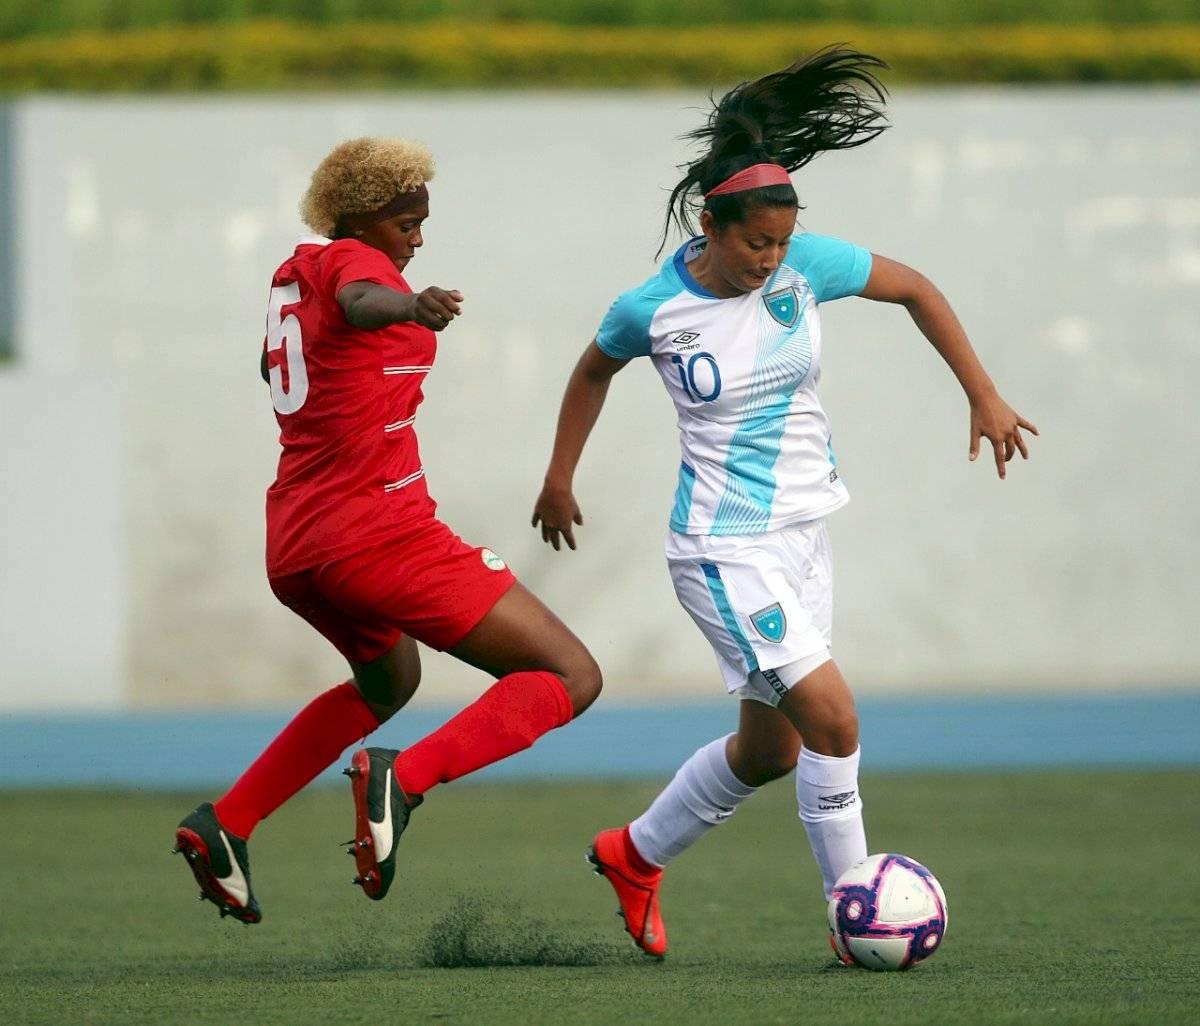 Guatemala vs Cuba, Torneo Uncaf FIFA Forward Sub20 Femenino